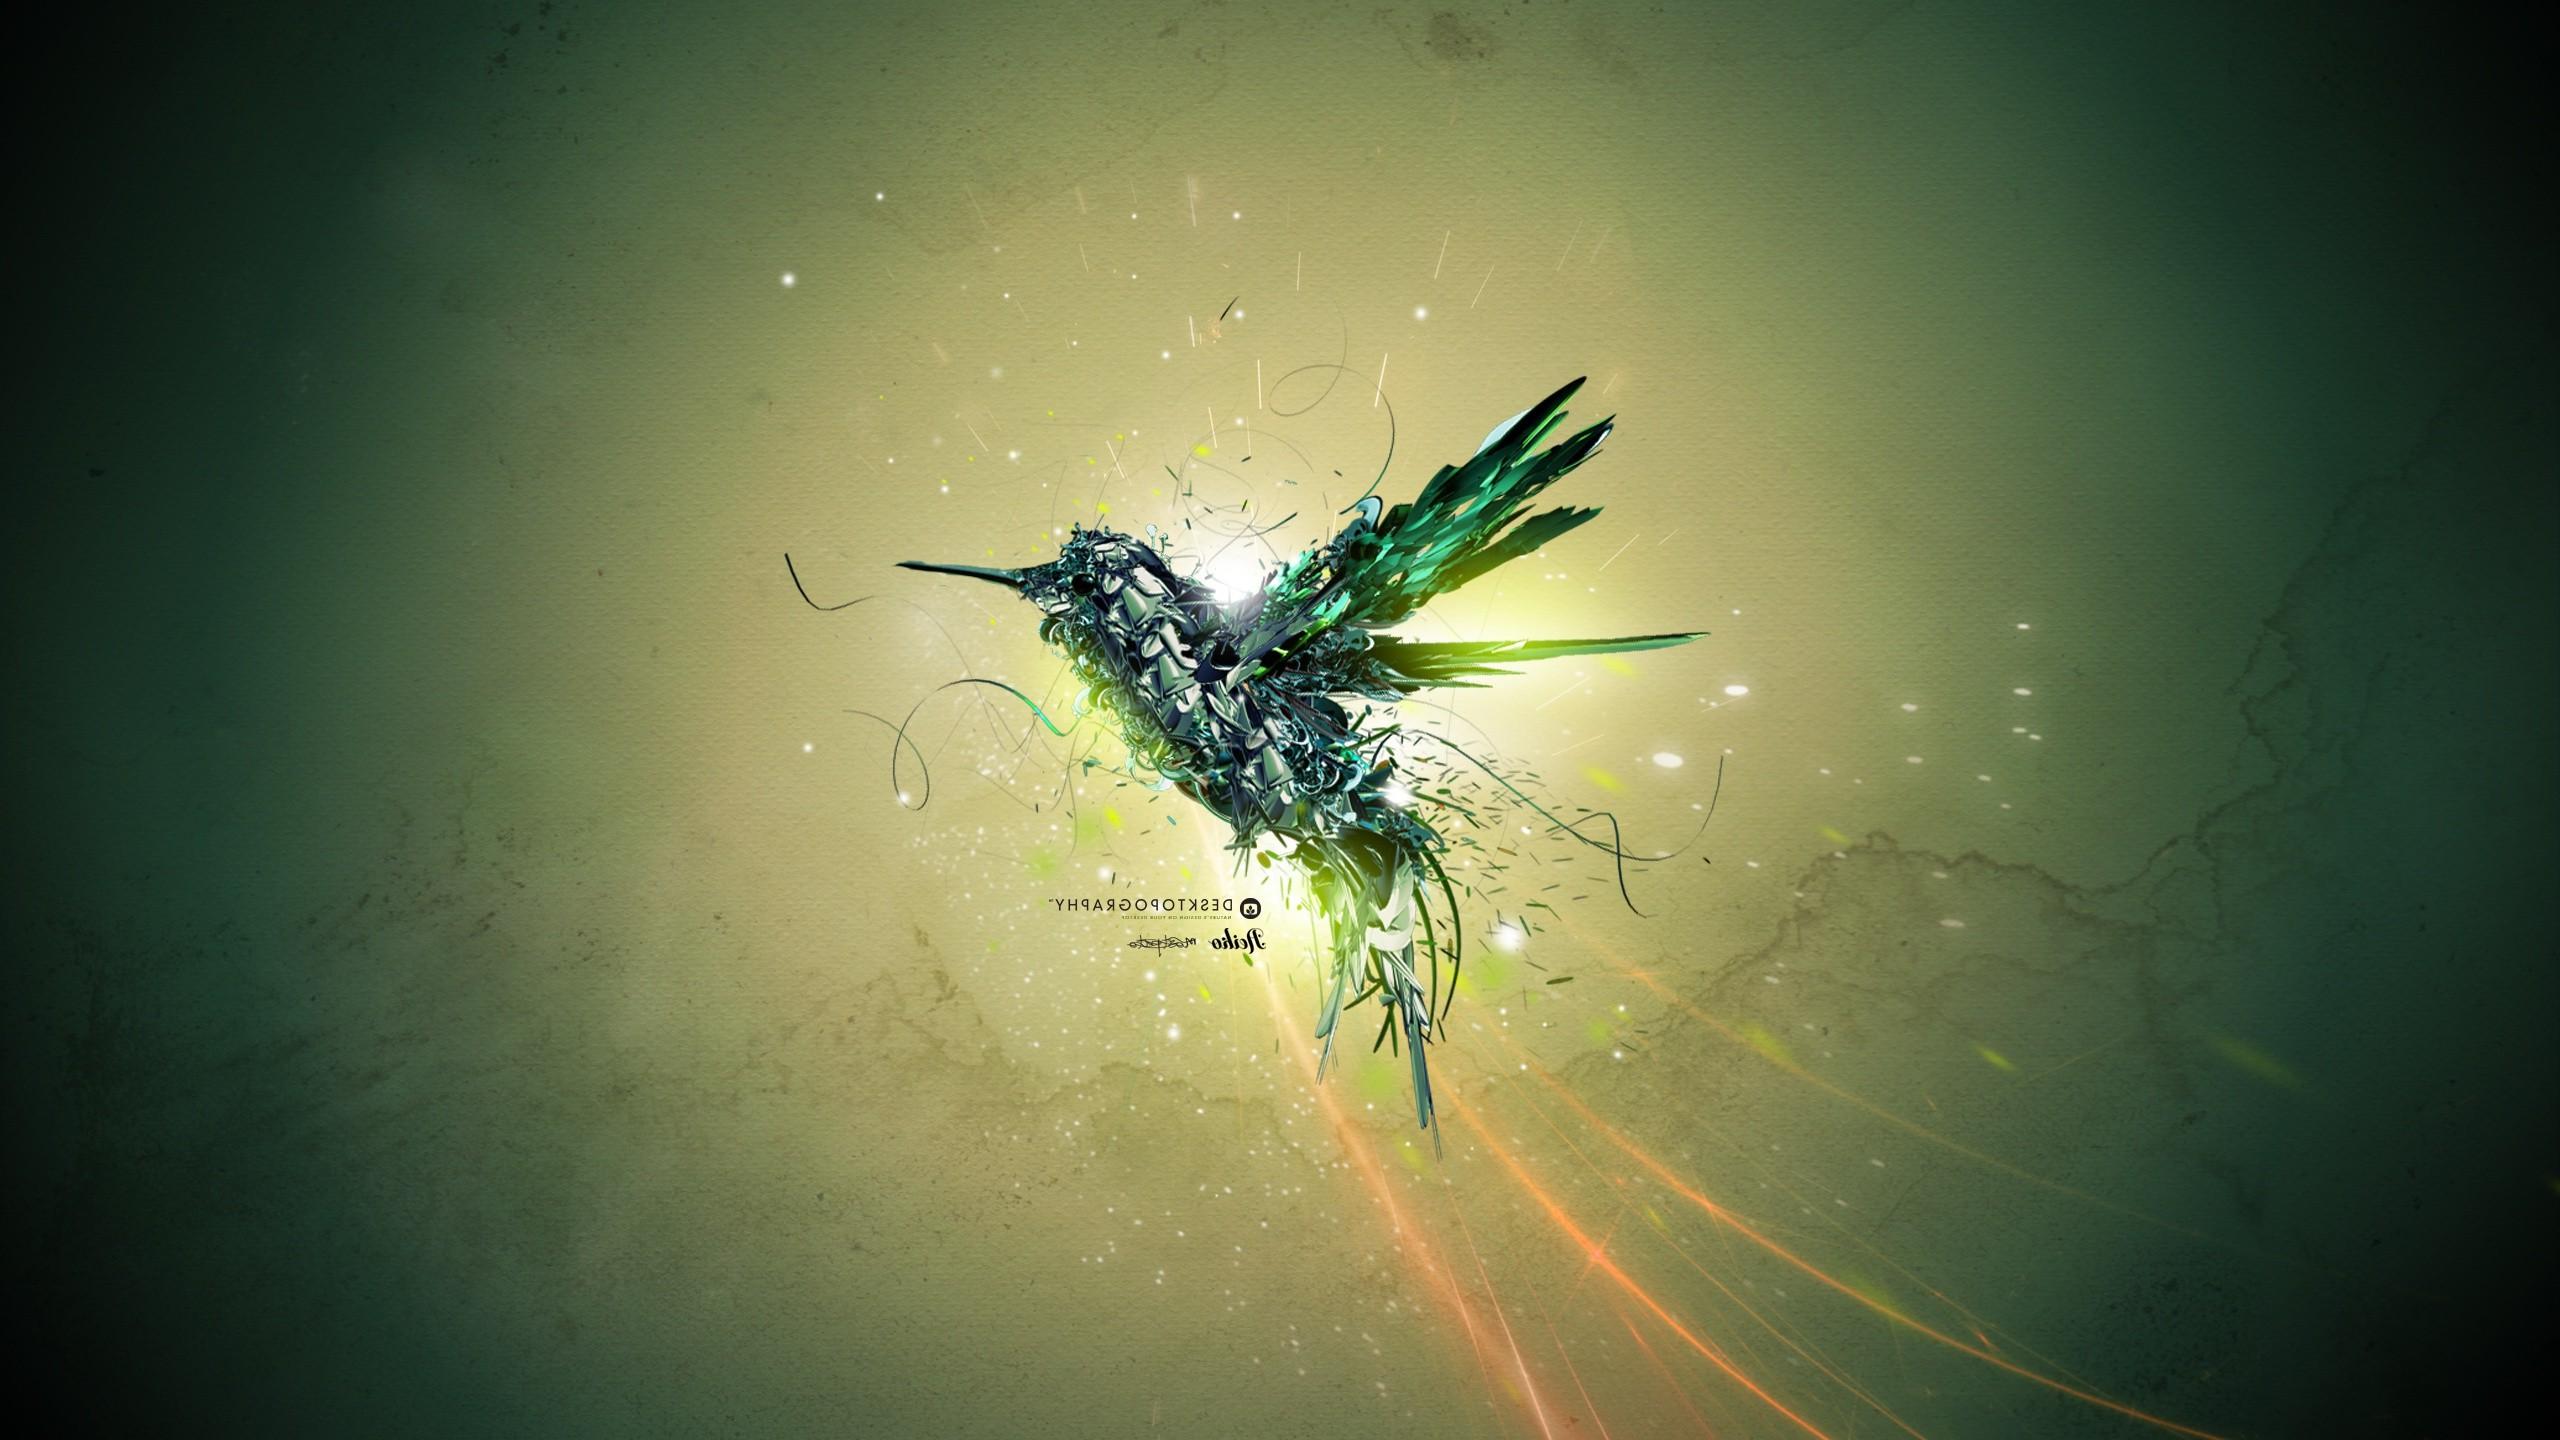 2560x1440 Px Animals Birds Desktopography Digital Art Hummingbirds Nature